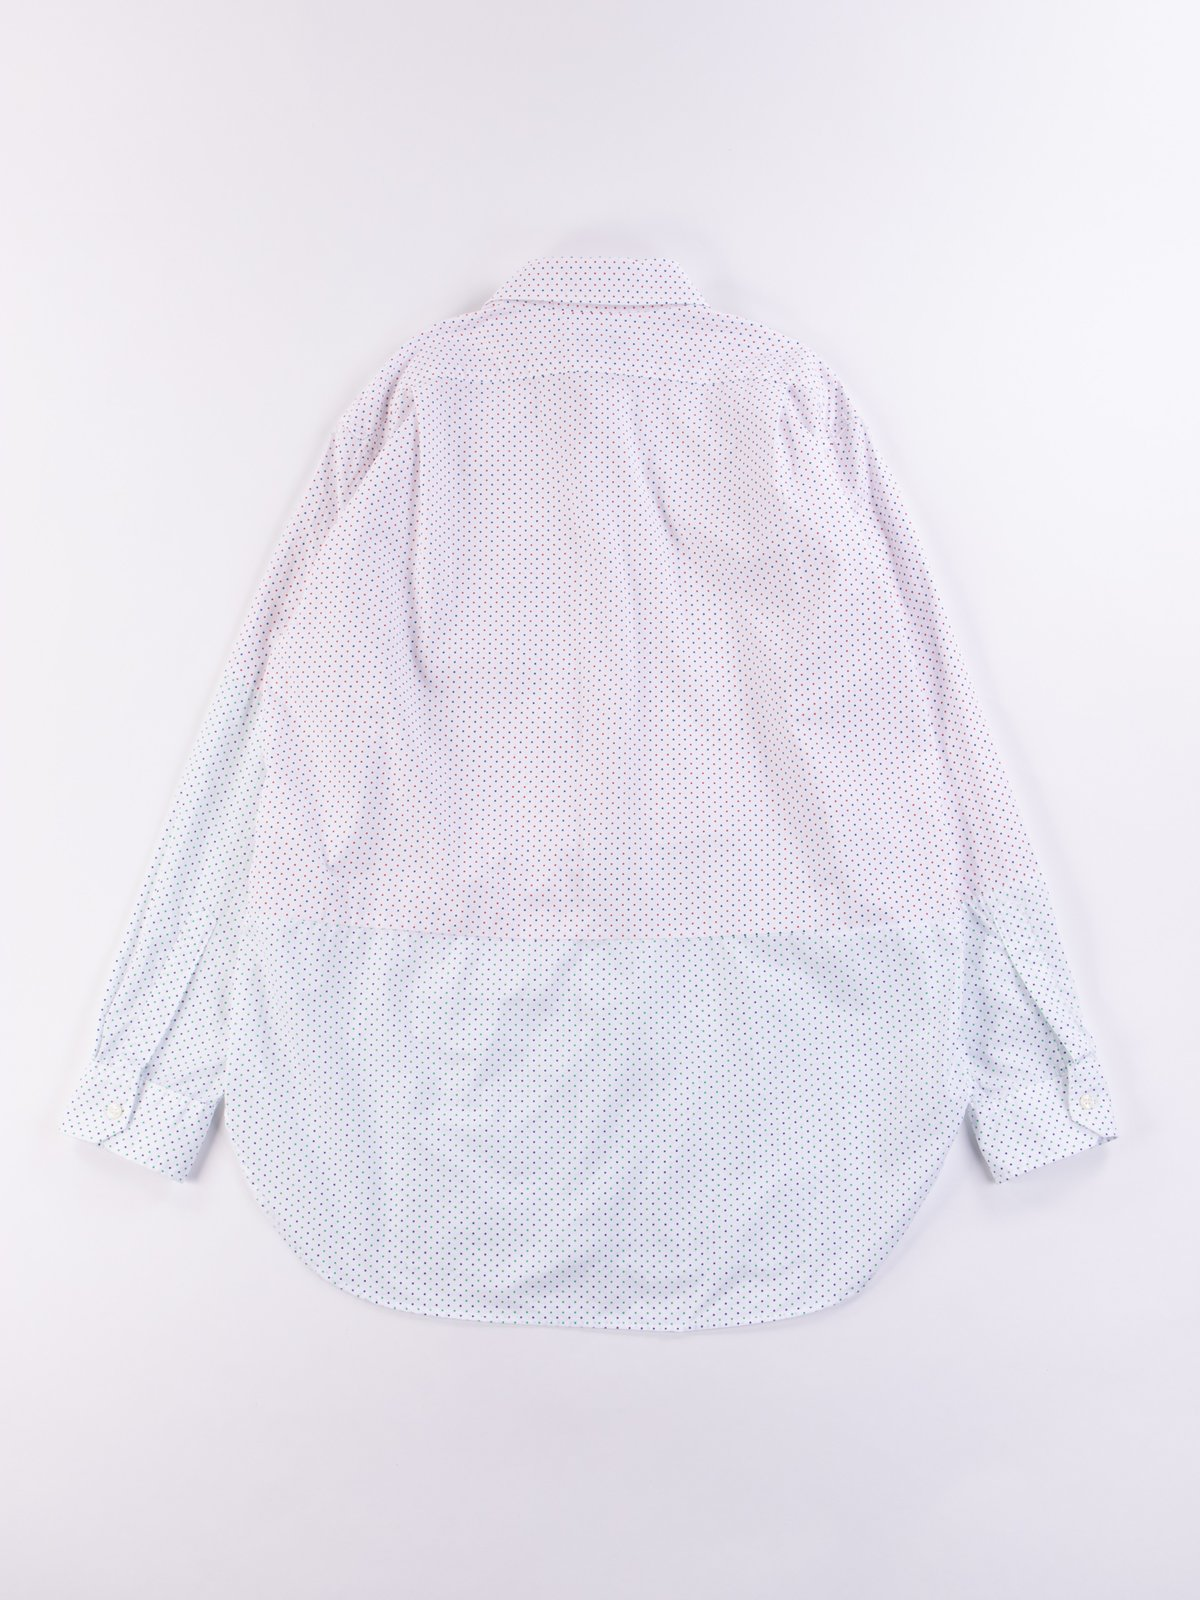 Red/Navy Small Polka Dot Spread Collar Shirt - Image 6